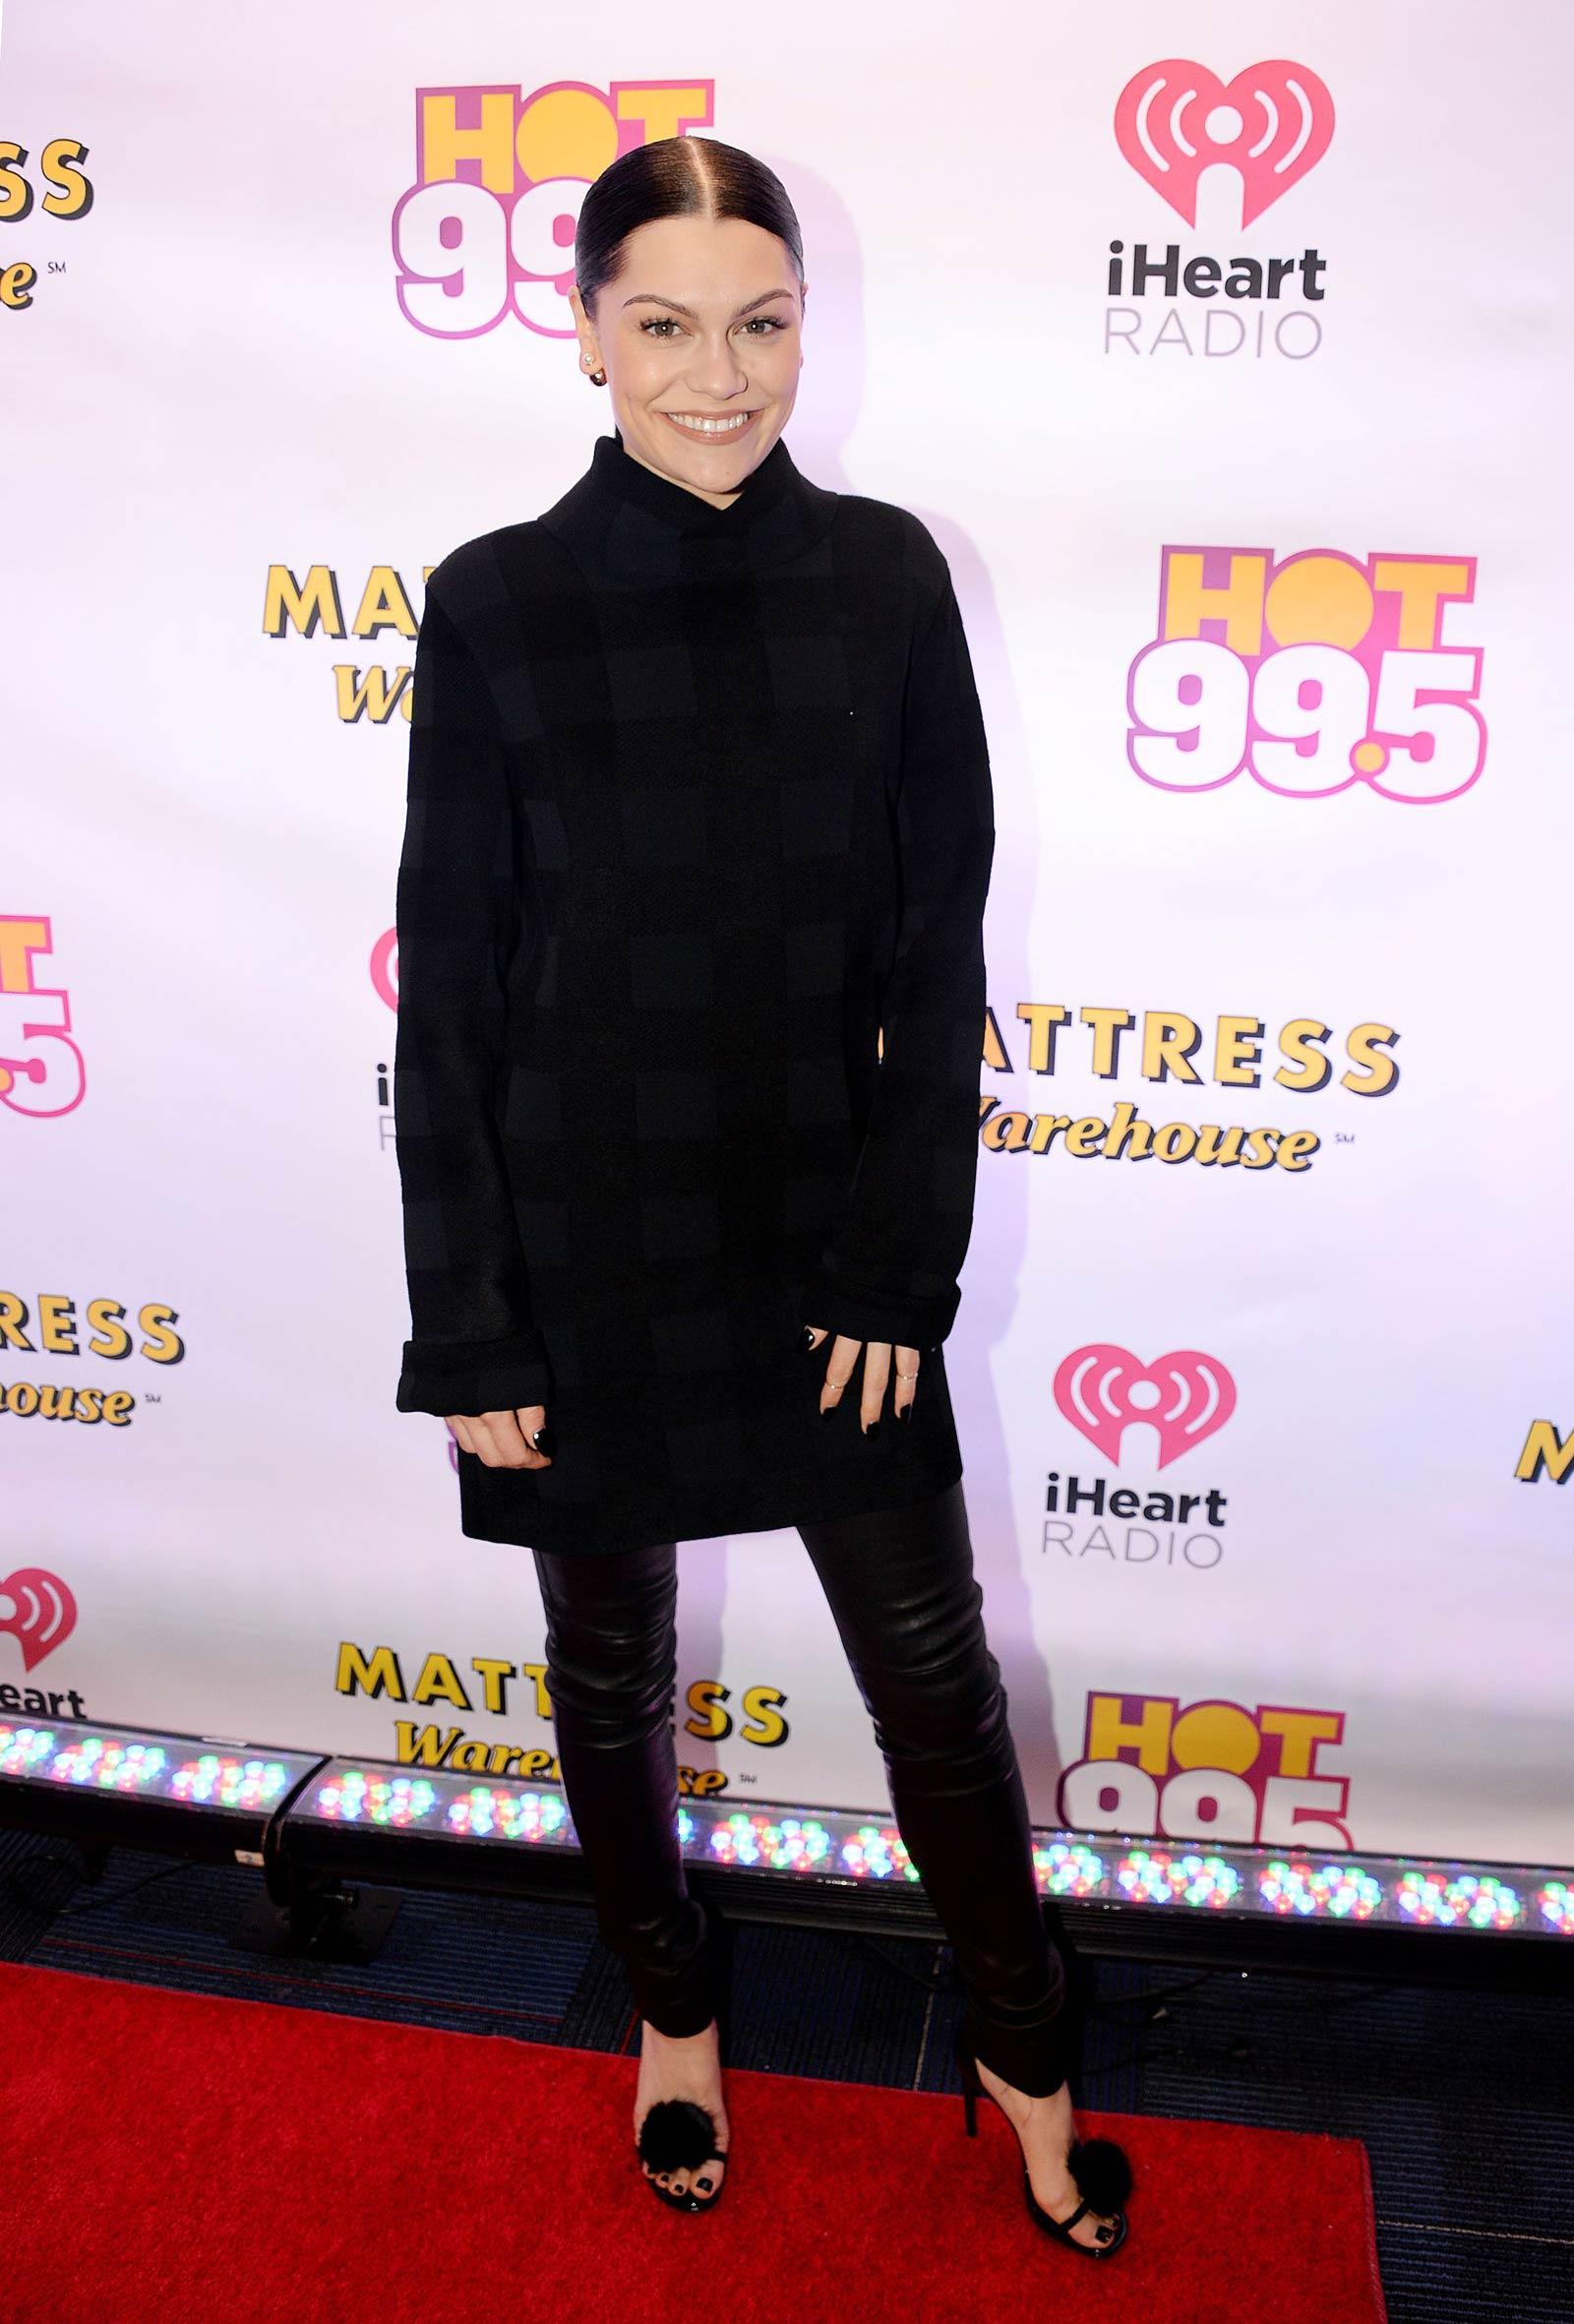 Jessie J attends HOT 99.5 Jingle Ball 2014